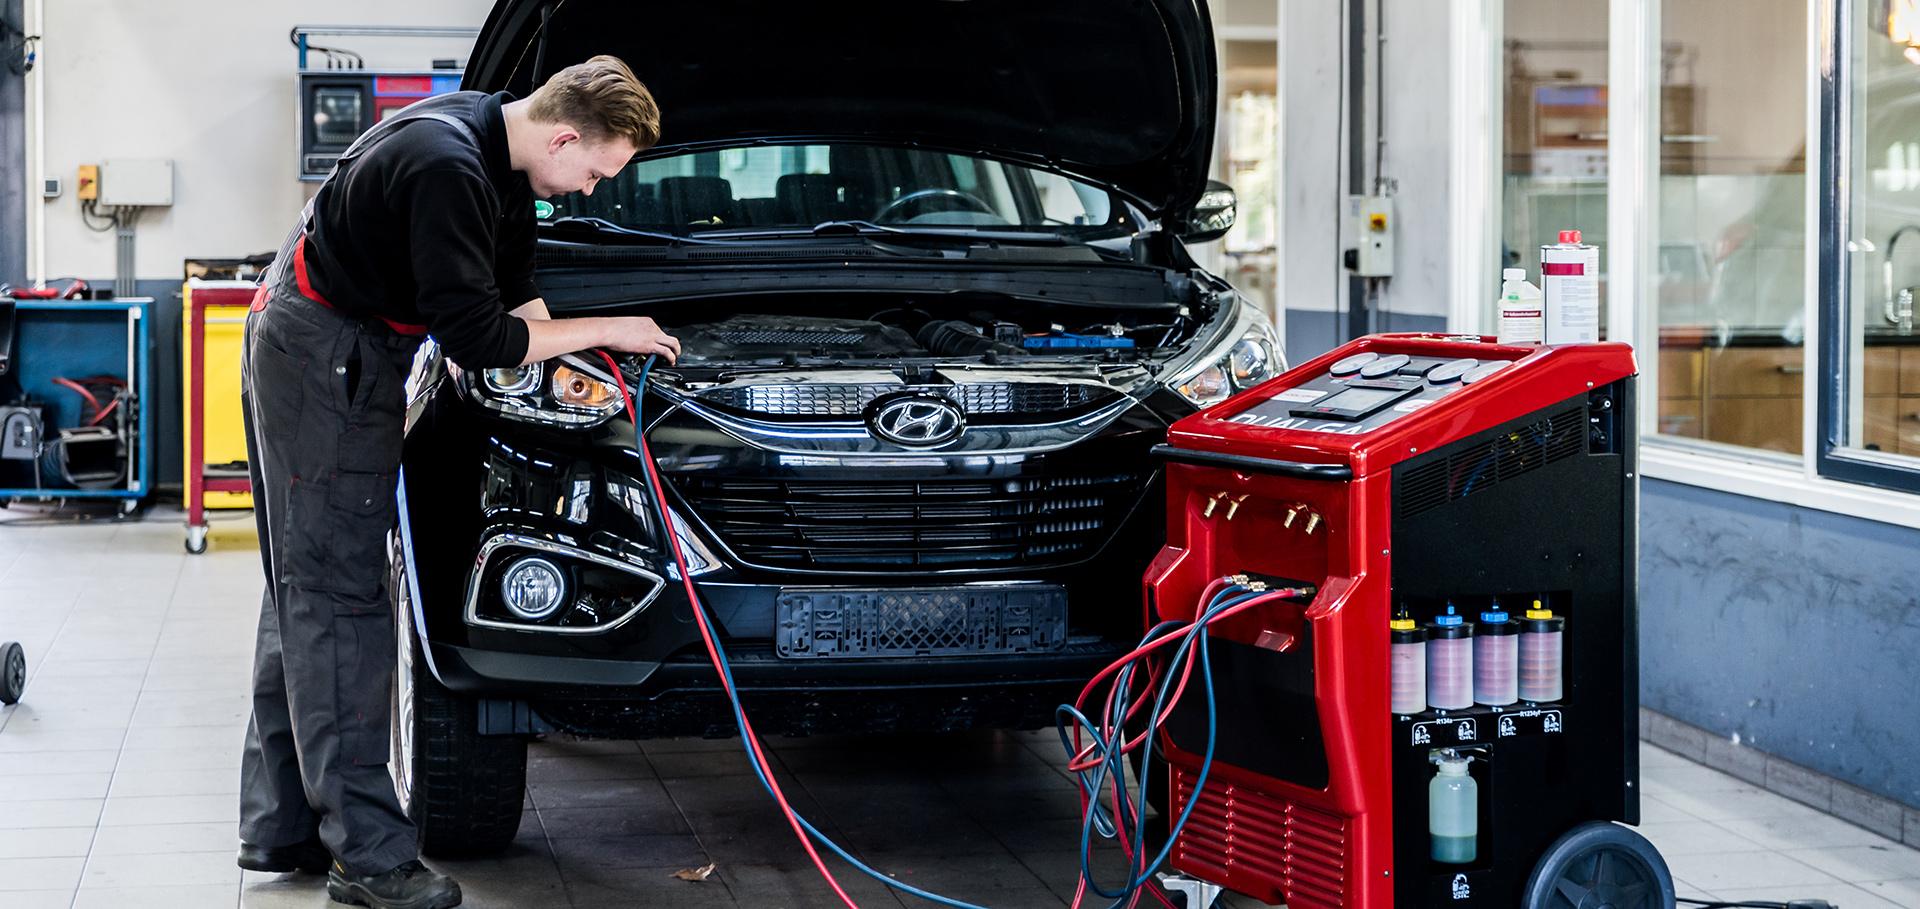 Airco onderhoud Autobedrijf John Klein Gunnewiek